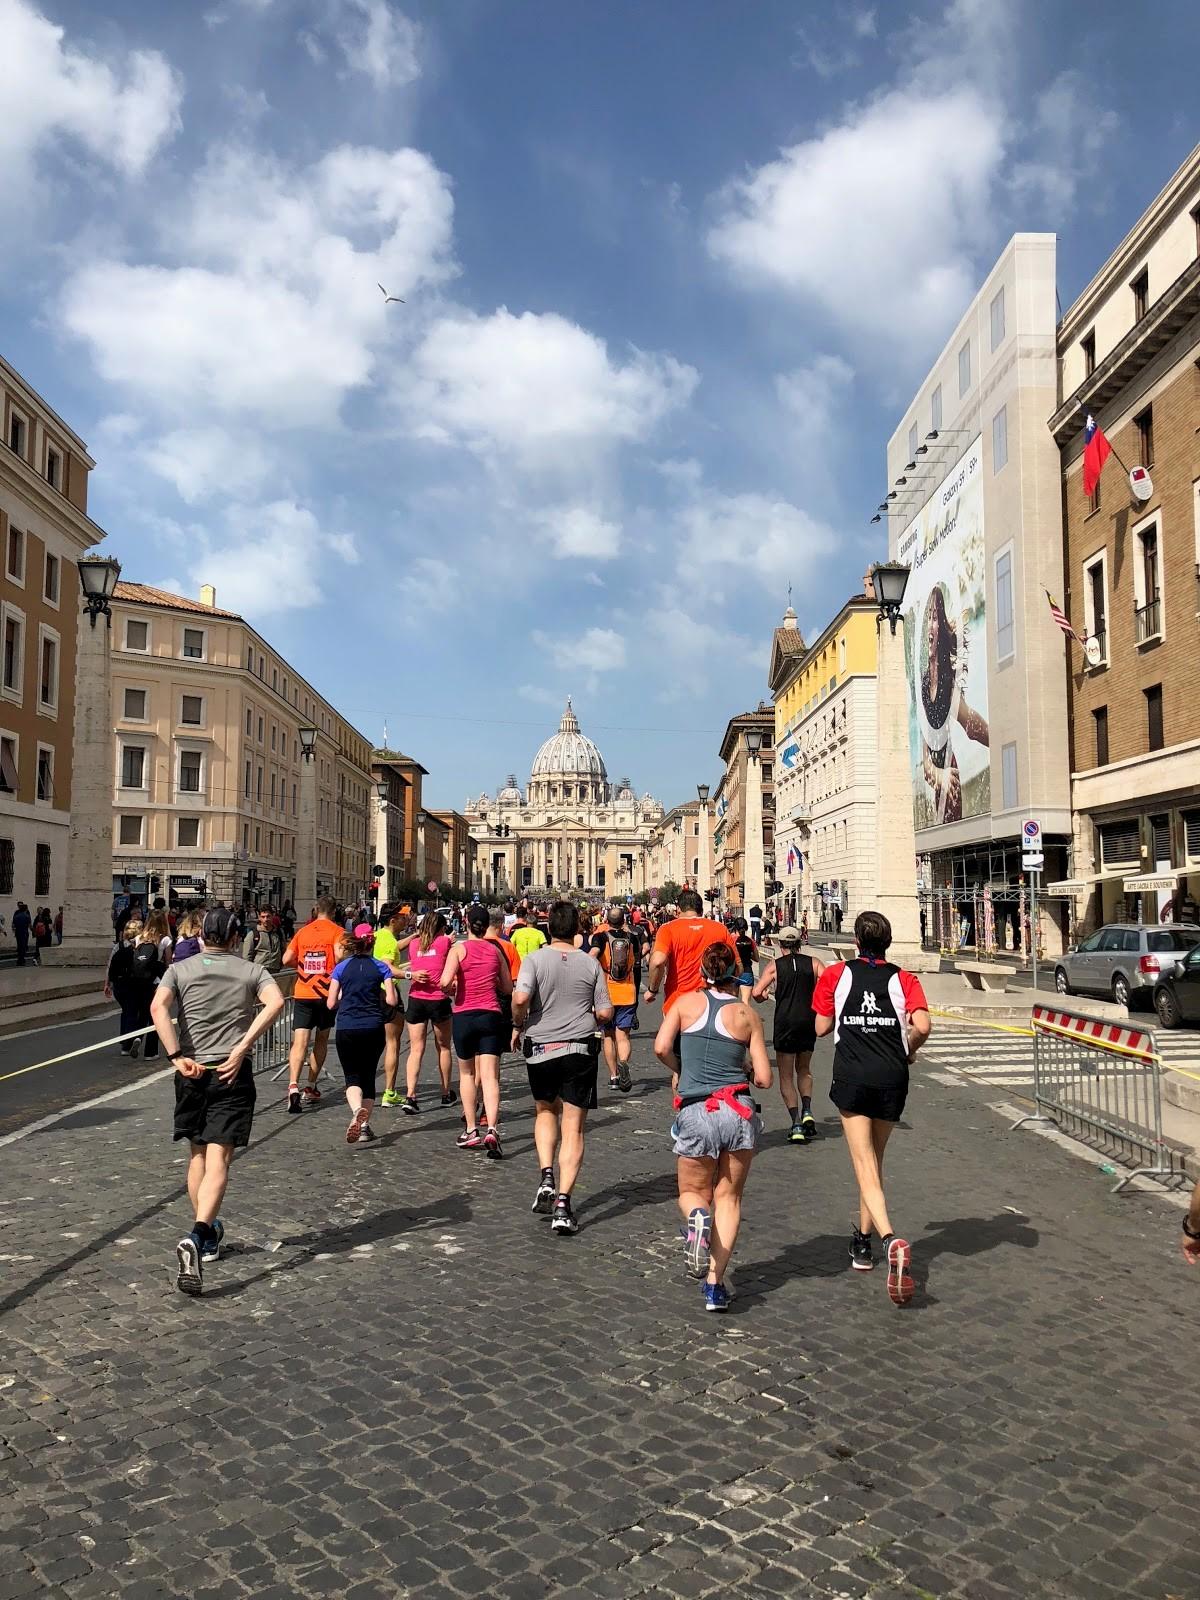 [Хабра-оффтоп] Maratona di Roma, или первый марафон для ИТ-шника - 4